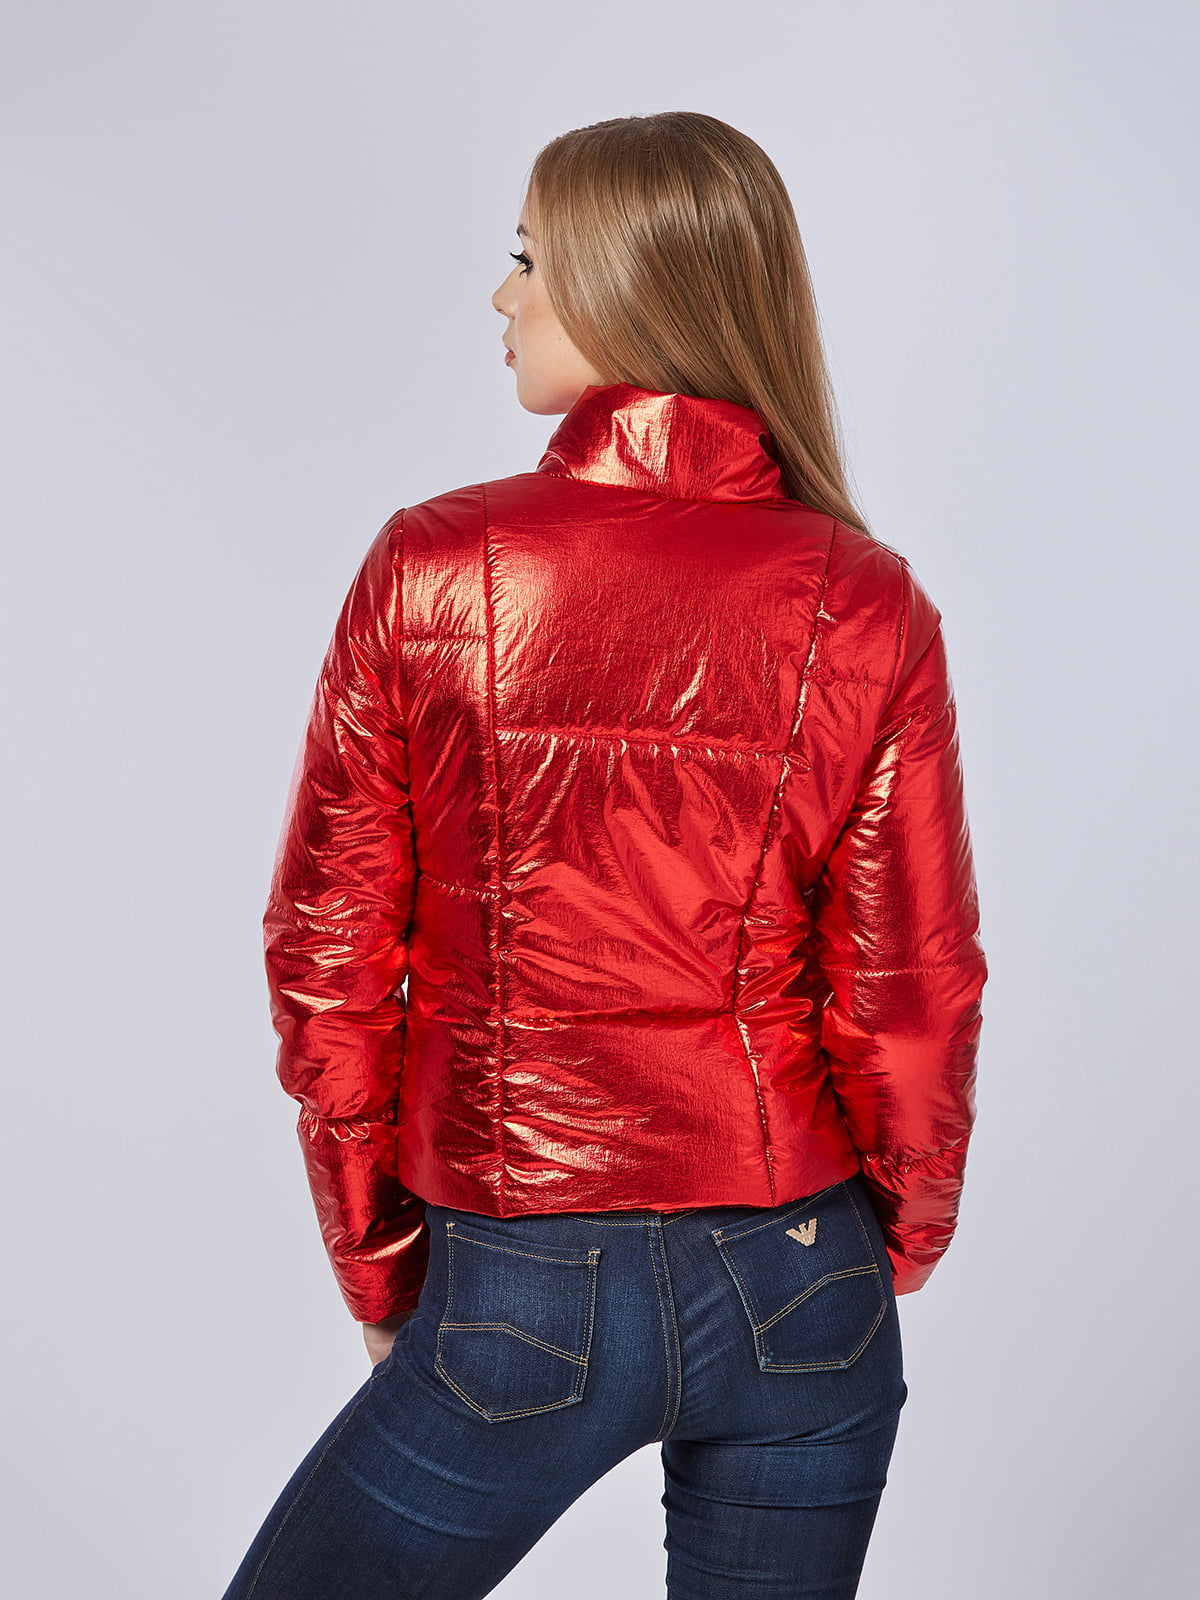 Куртка червона | 4202667 | фото 2